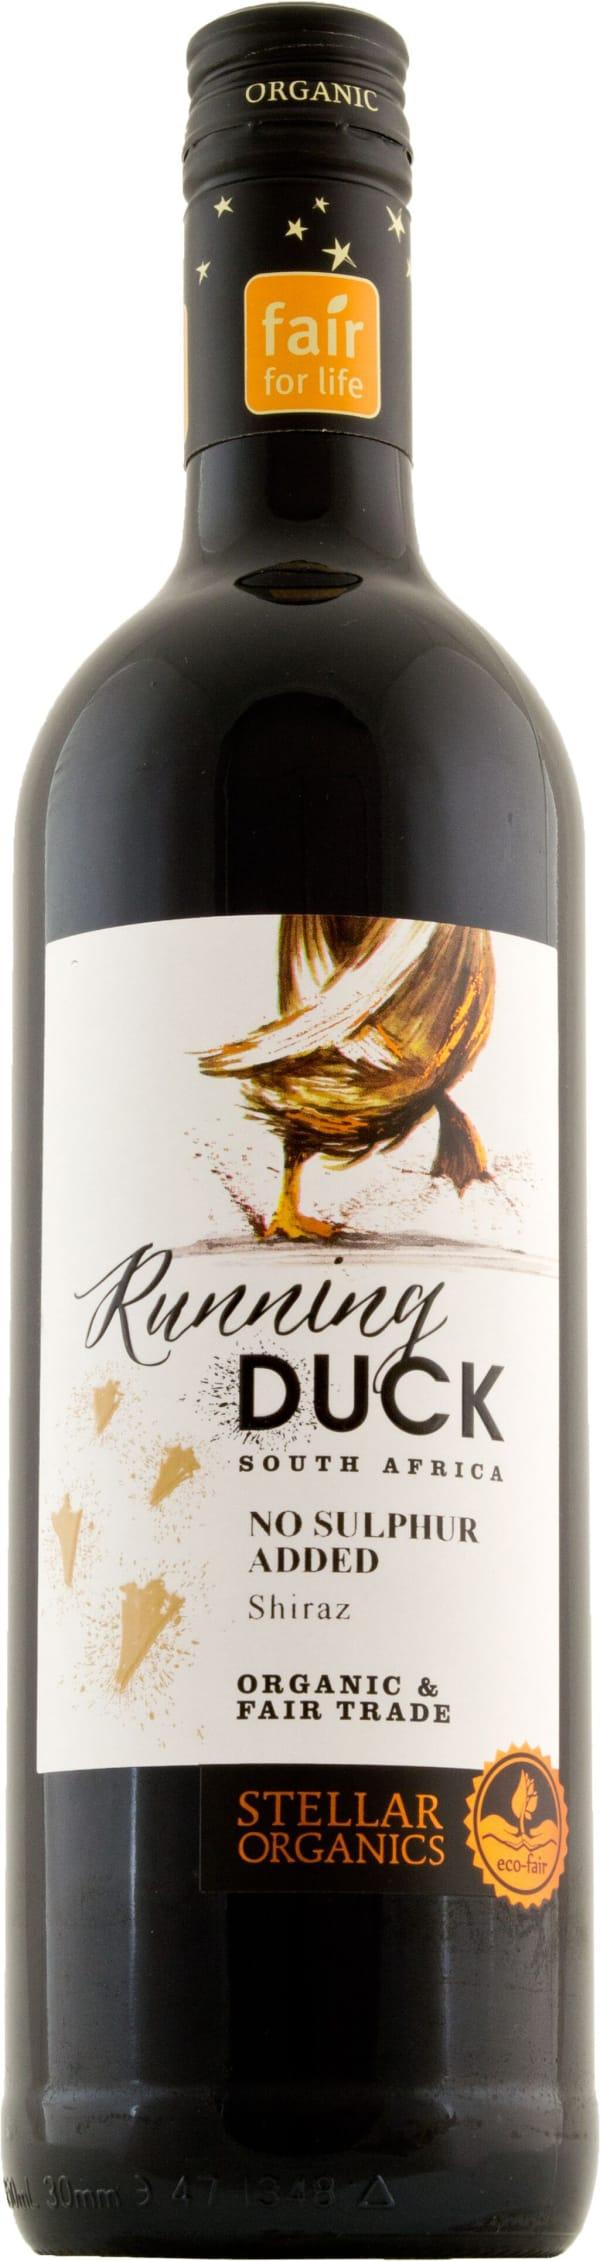 Running Duck Shiraz 2015